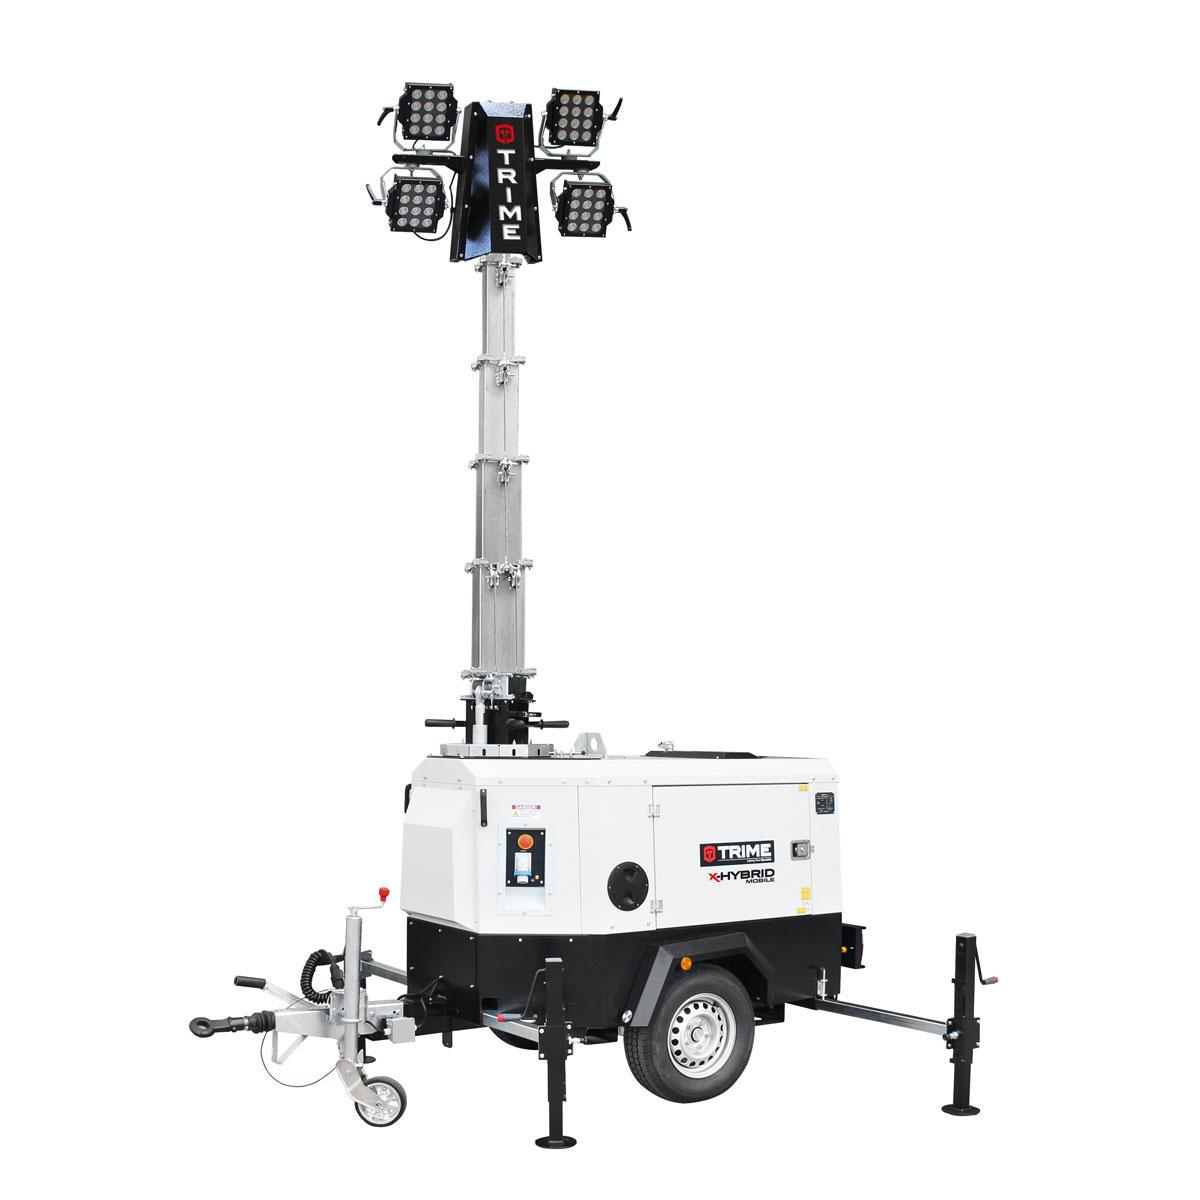 belysningsmast-led-x-hybrid-mobil-4x90W